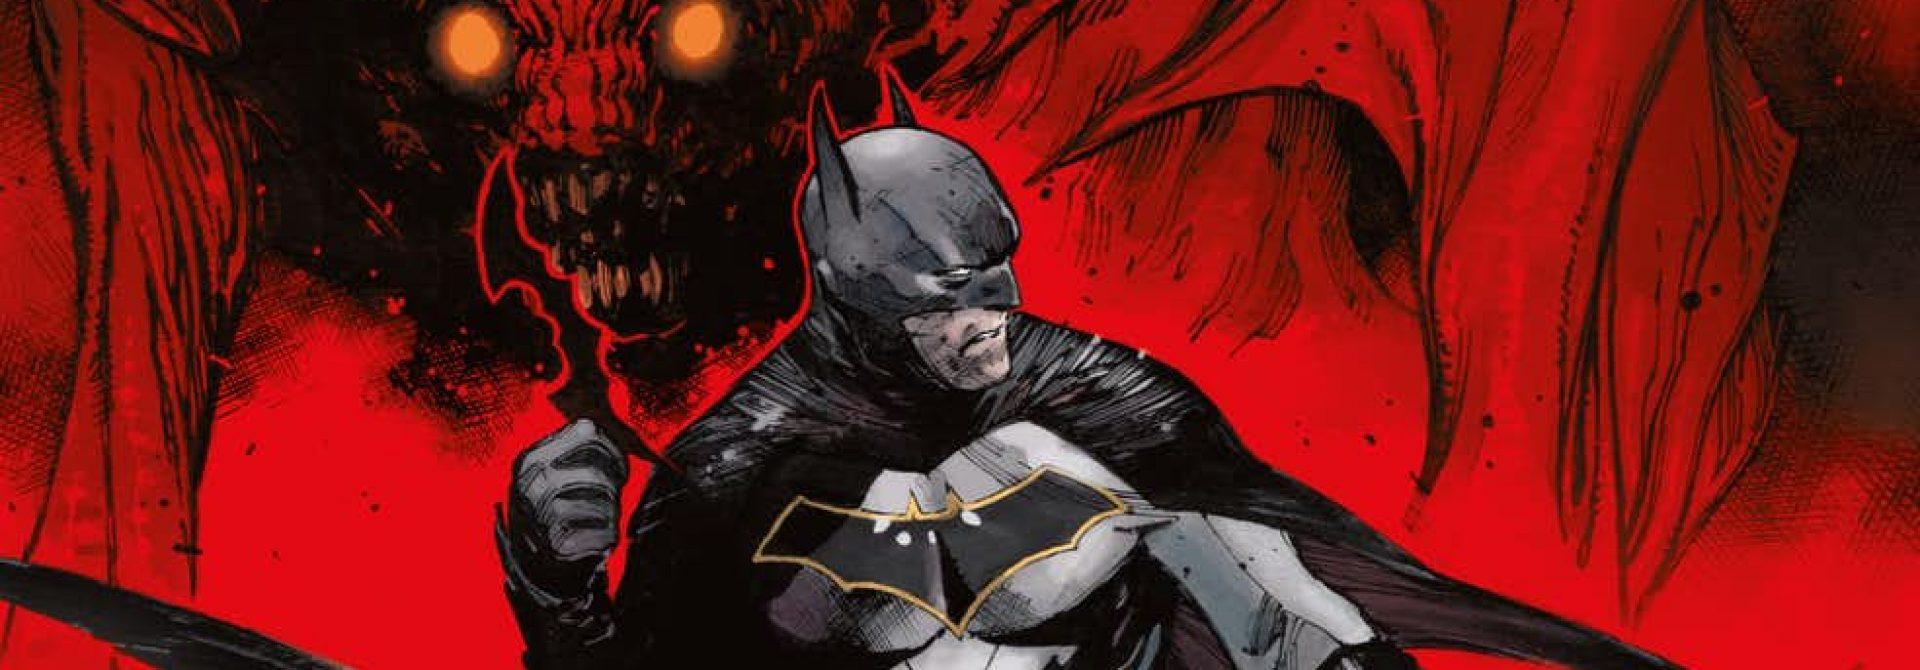 NYCC 2017: Batman Lost Preview